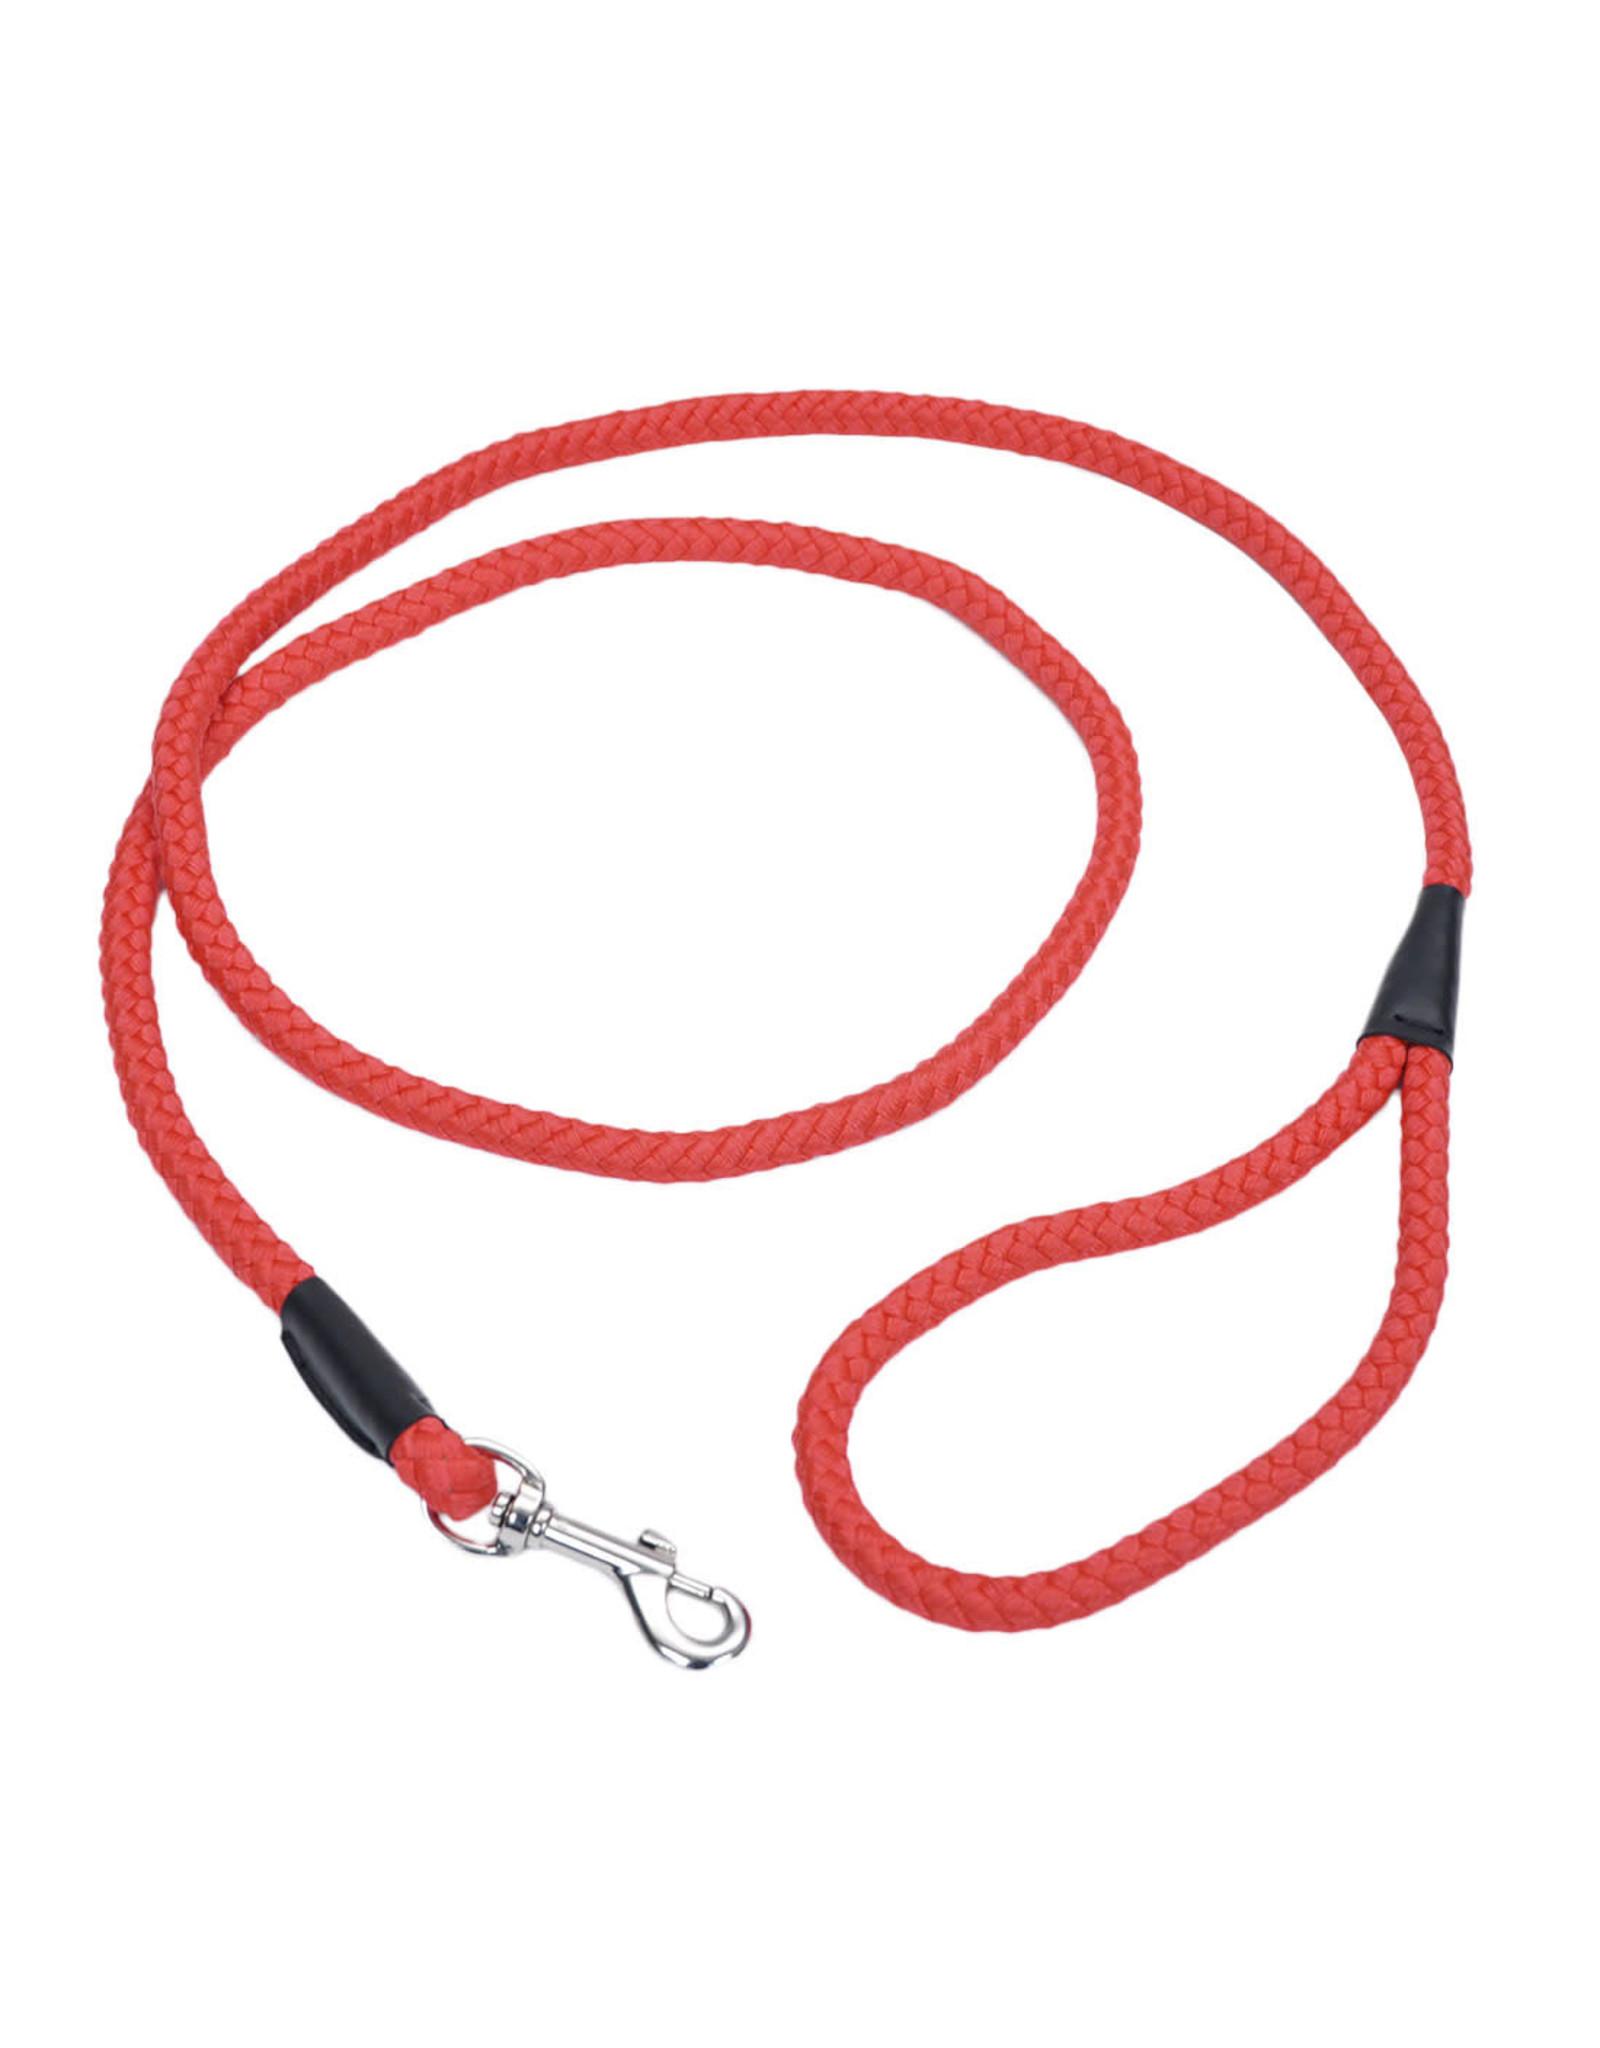 Coastal Pet Products Coastal Rope Leash 6'